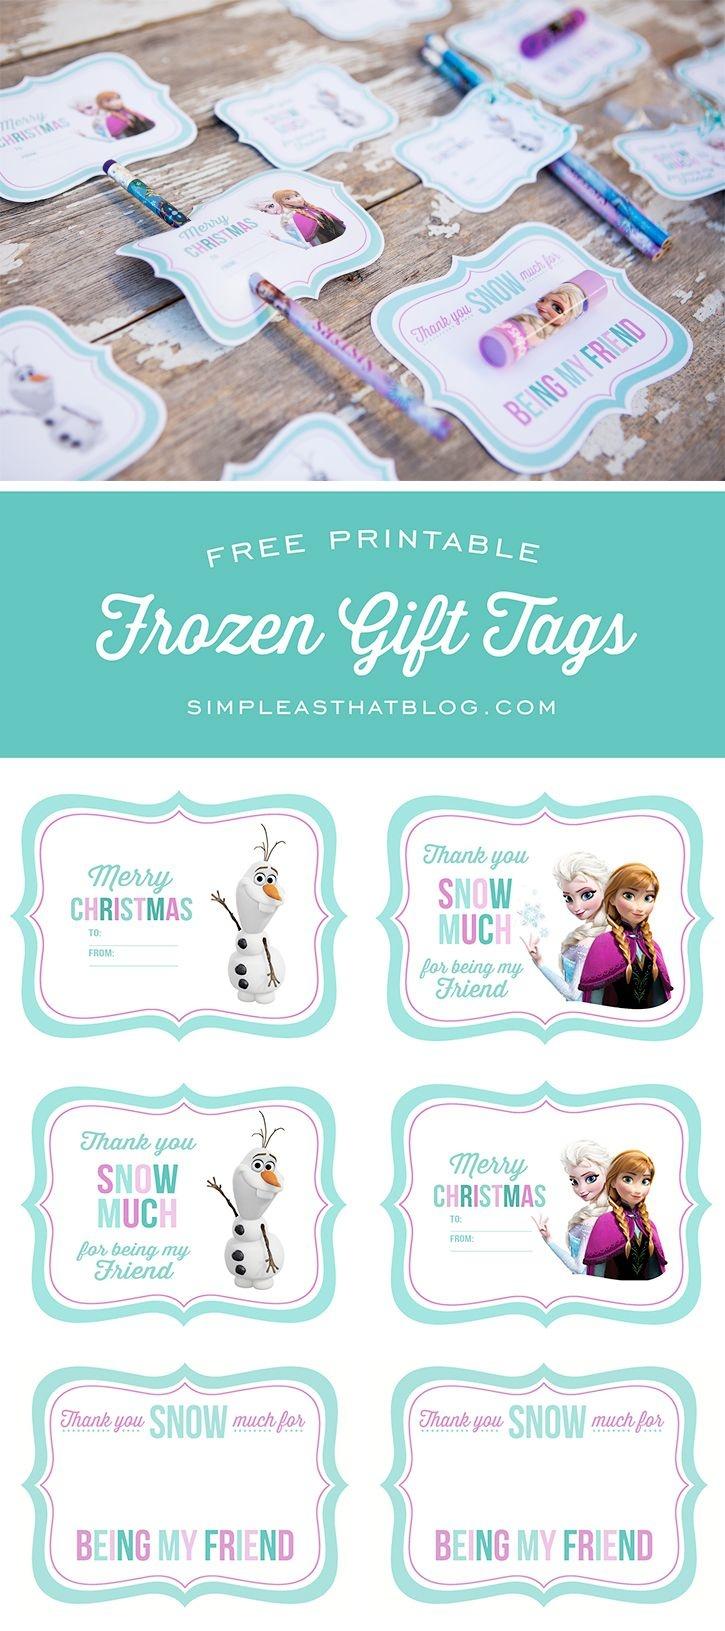 Free Printable Disney Frozen Gift Tags   Simple As That Printables - Party Favor Tags Free Printable